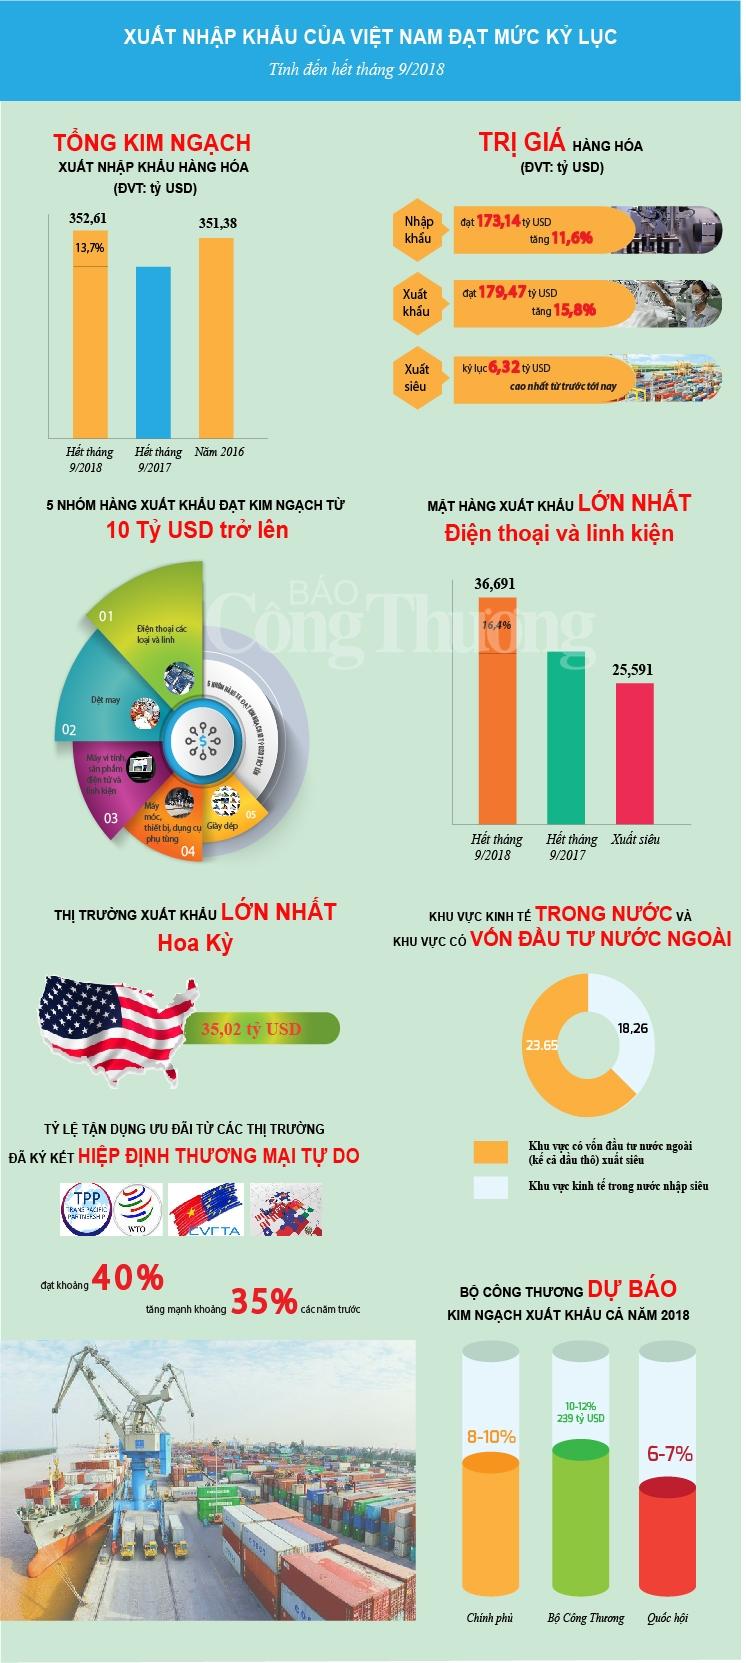 infographic xuat nhap khau dat muc ky luc